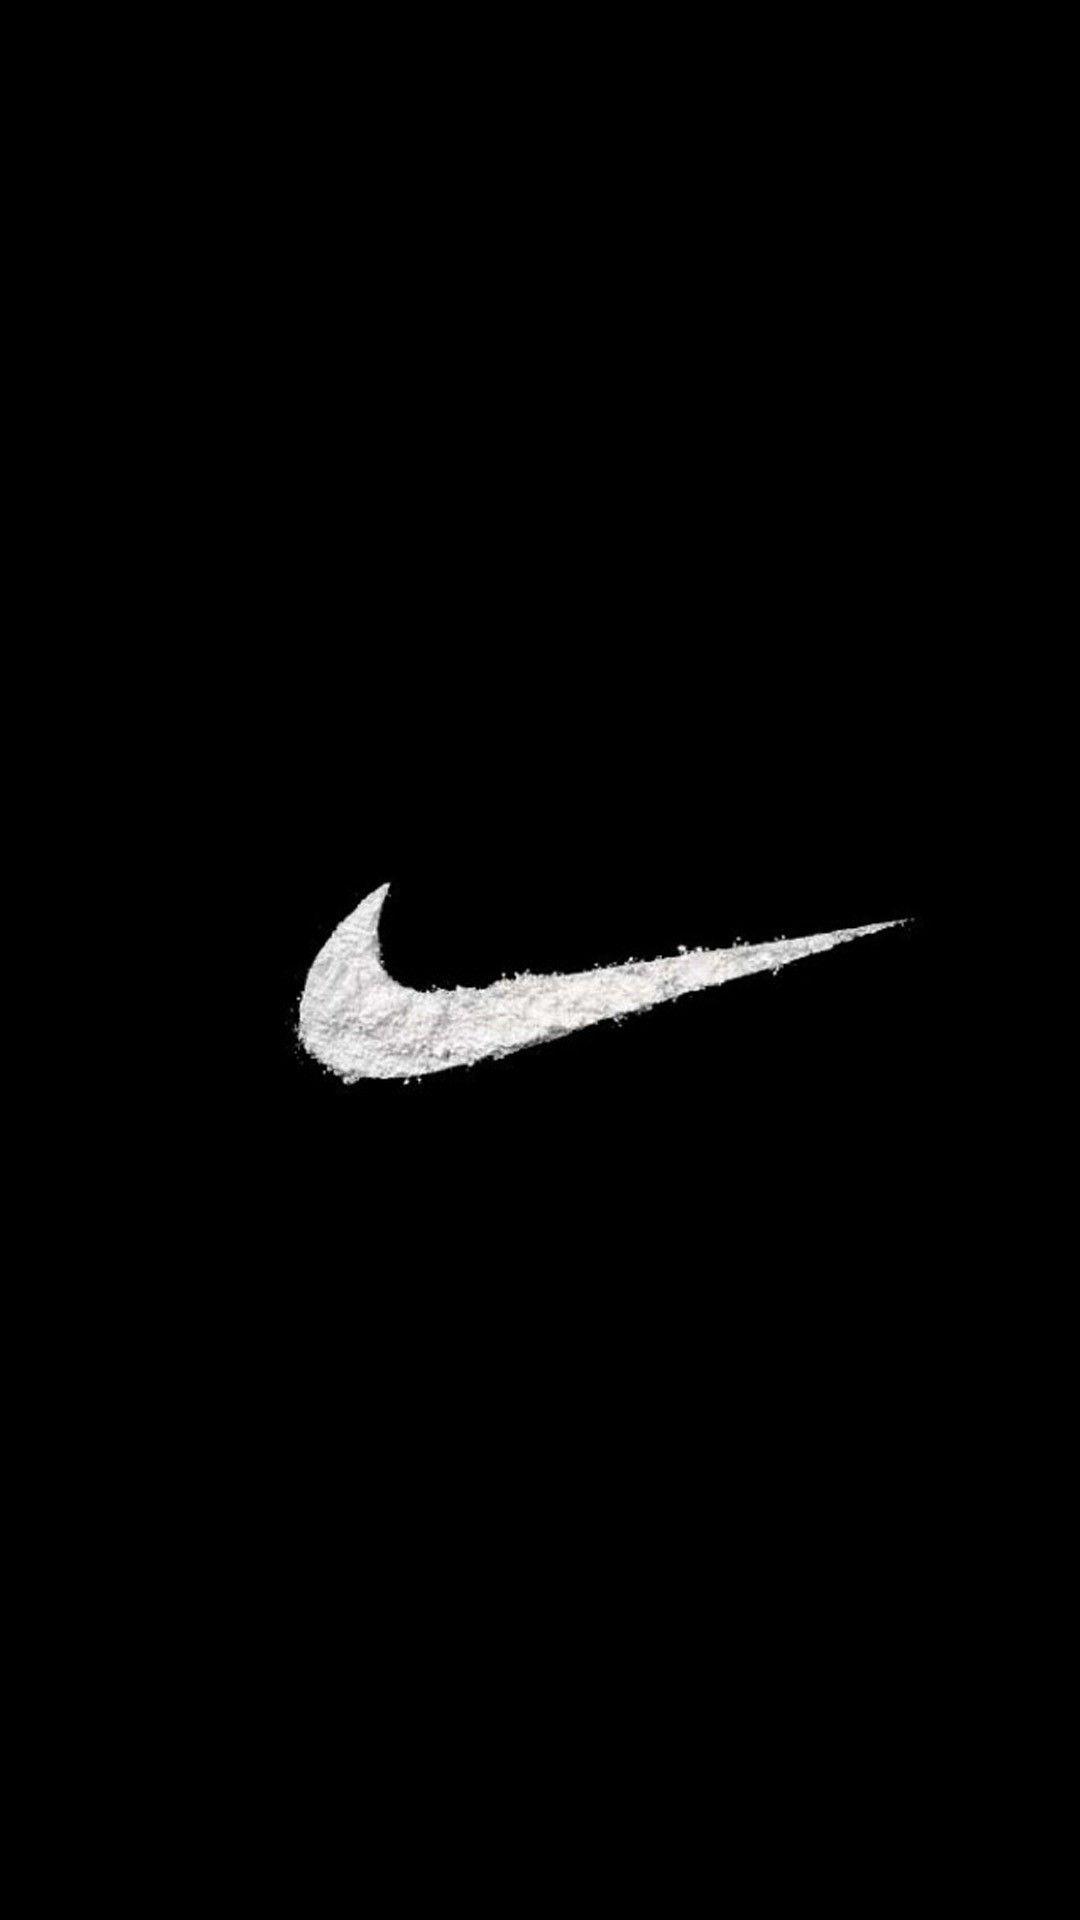 1080x1920 Nike Wallpaper Nike Wallpaper Nike Logo Wallpapers Black Nike Wallpaper